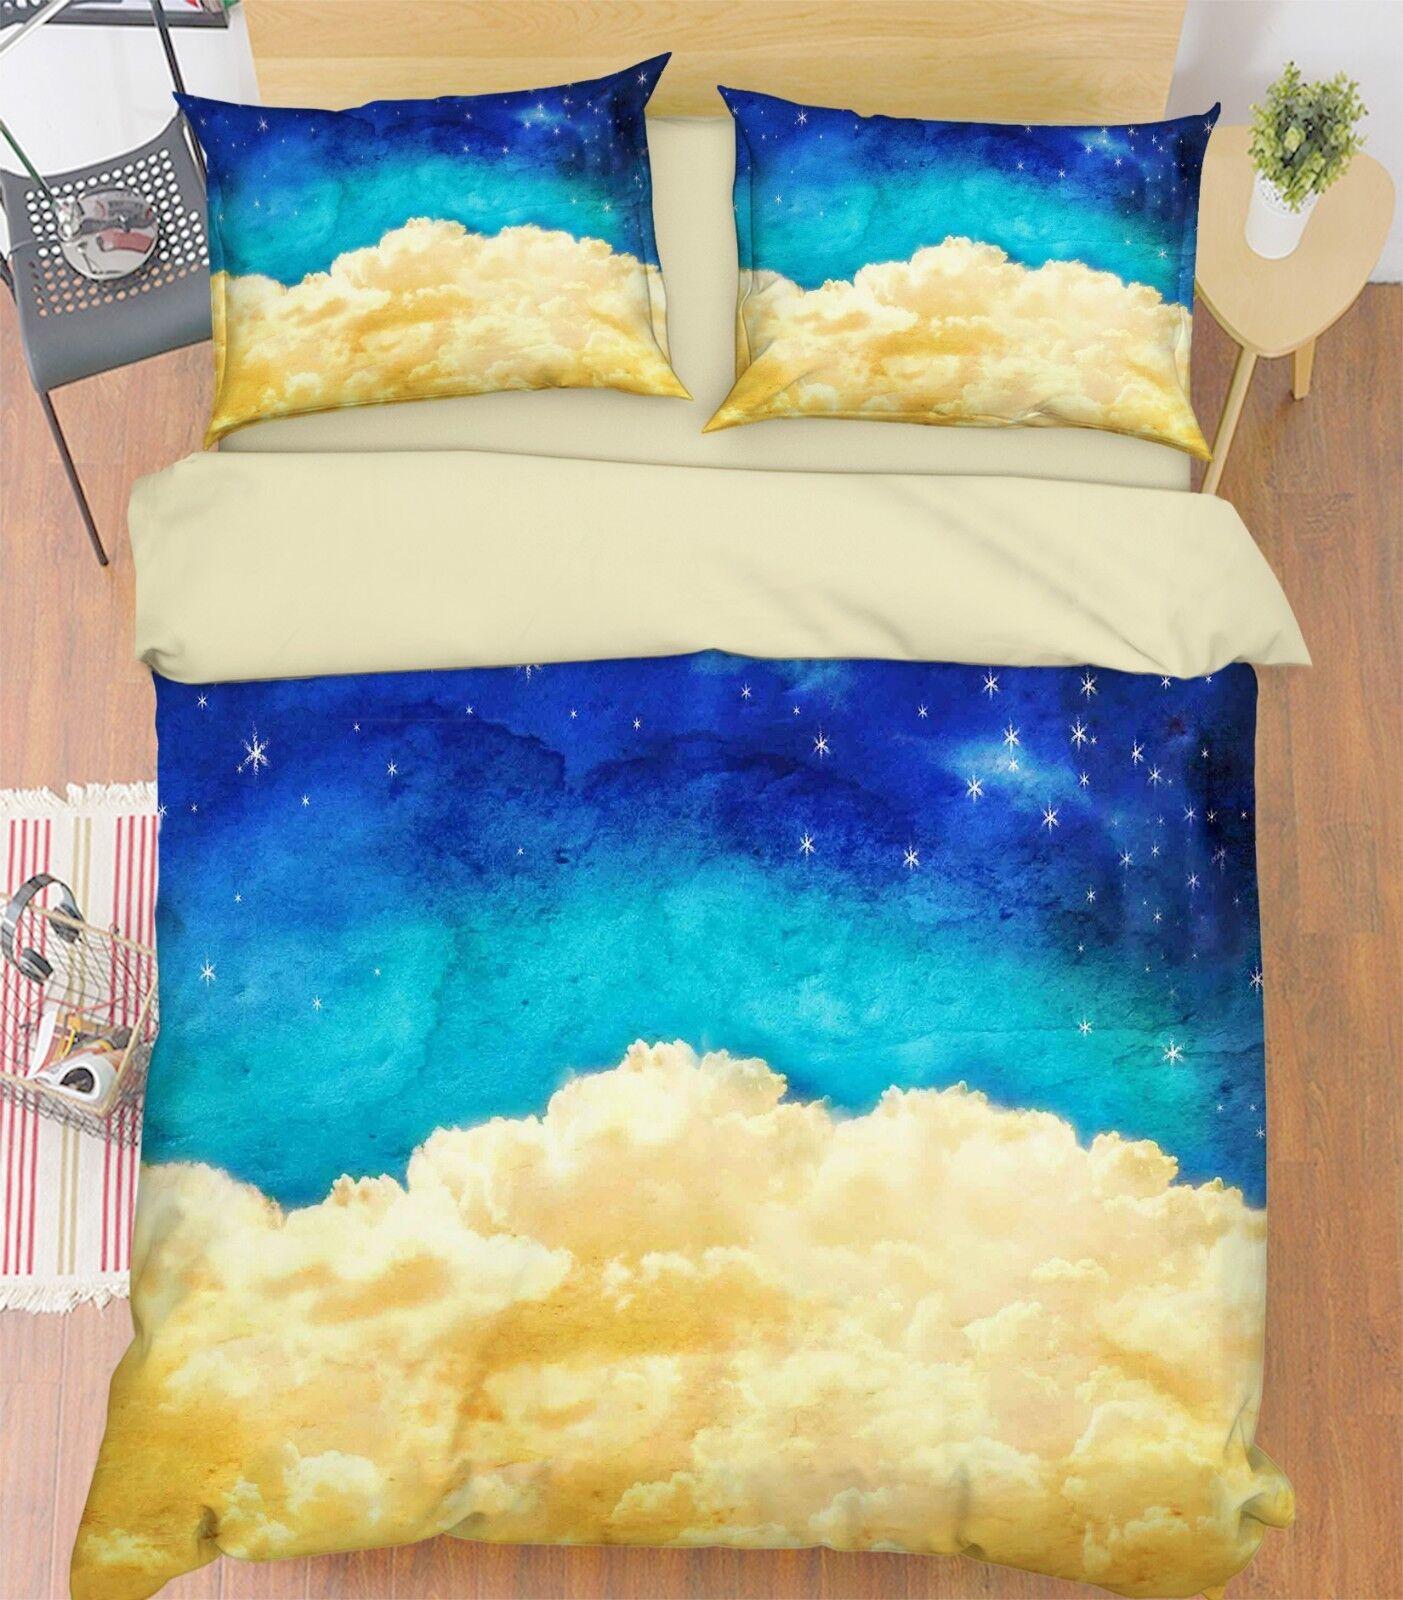 3D Nature Cloud Sky 5 Bed Pillowcases Quilt Duvet Cover Set Single King UK Lemon